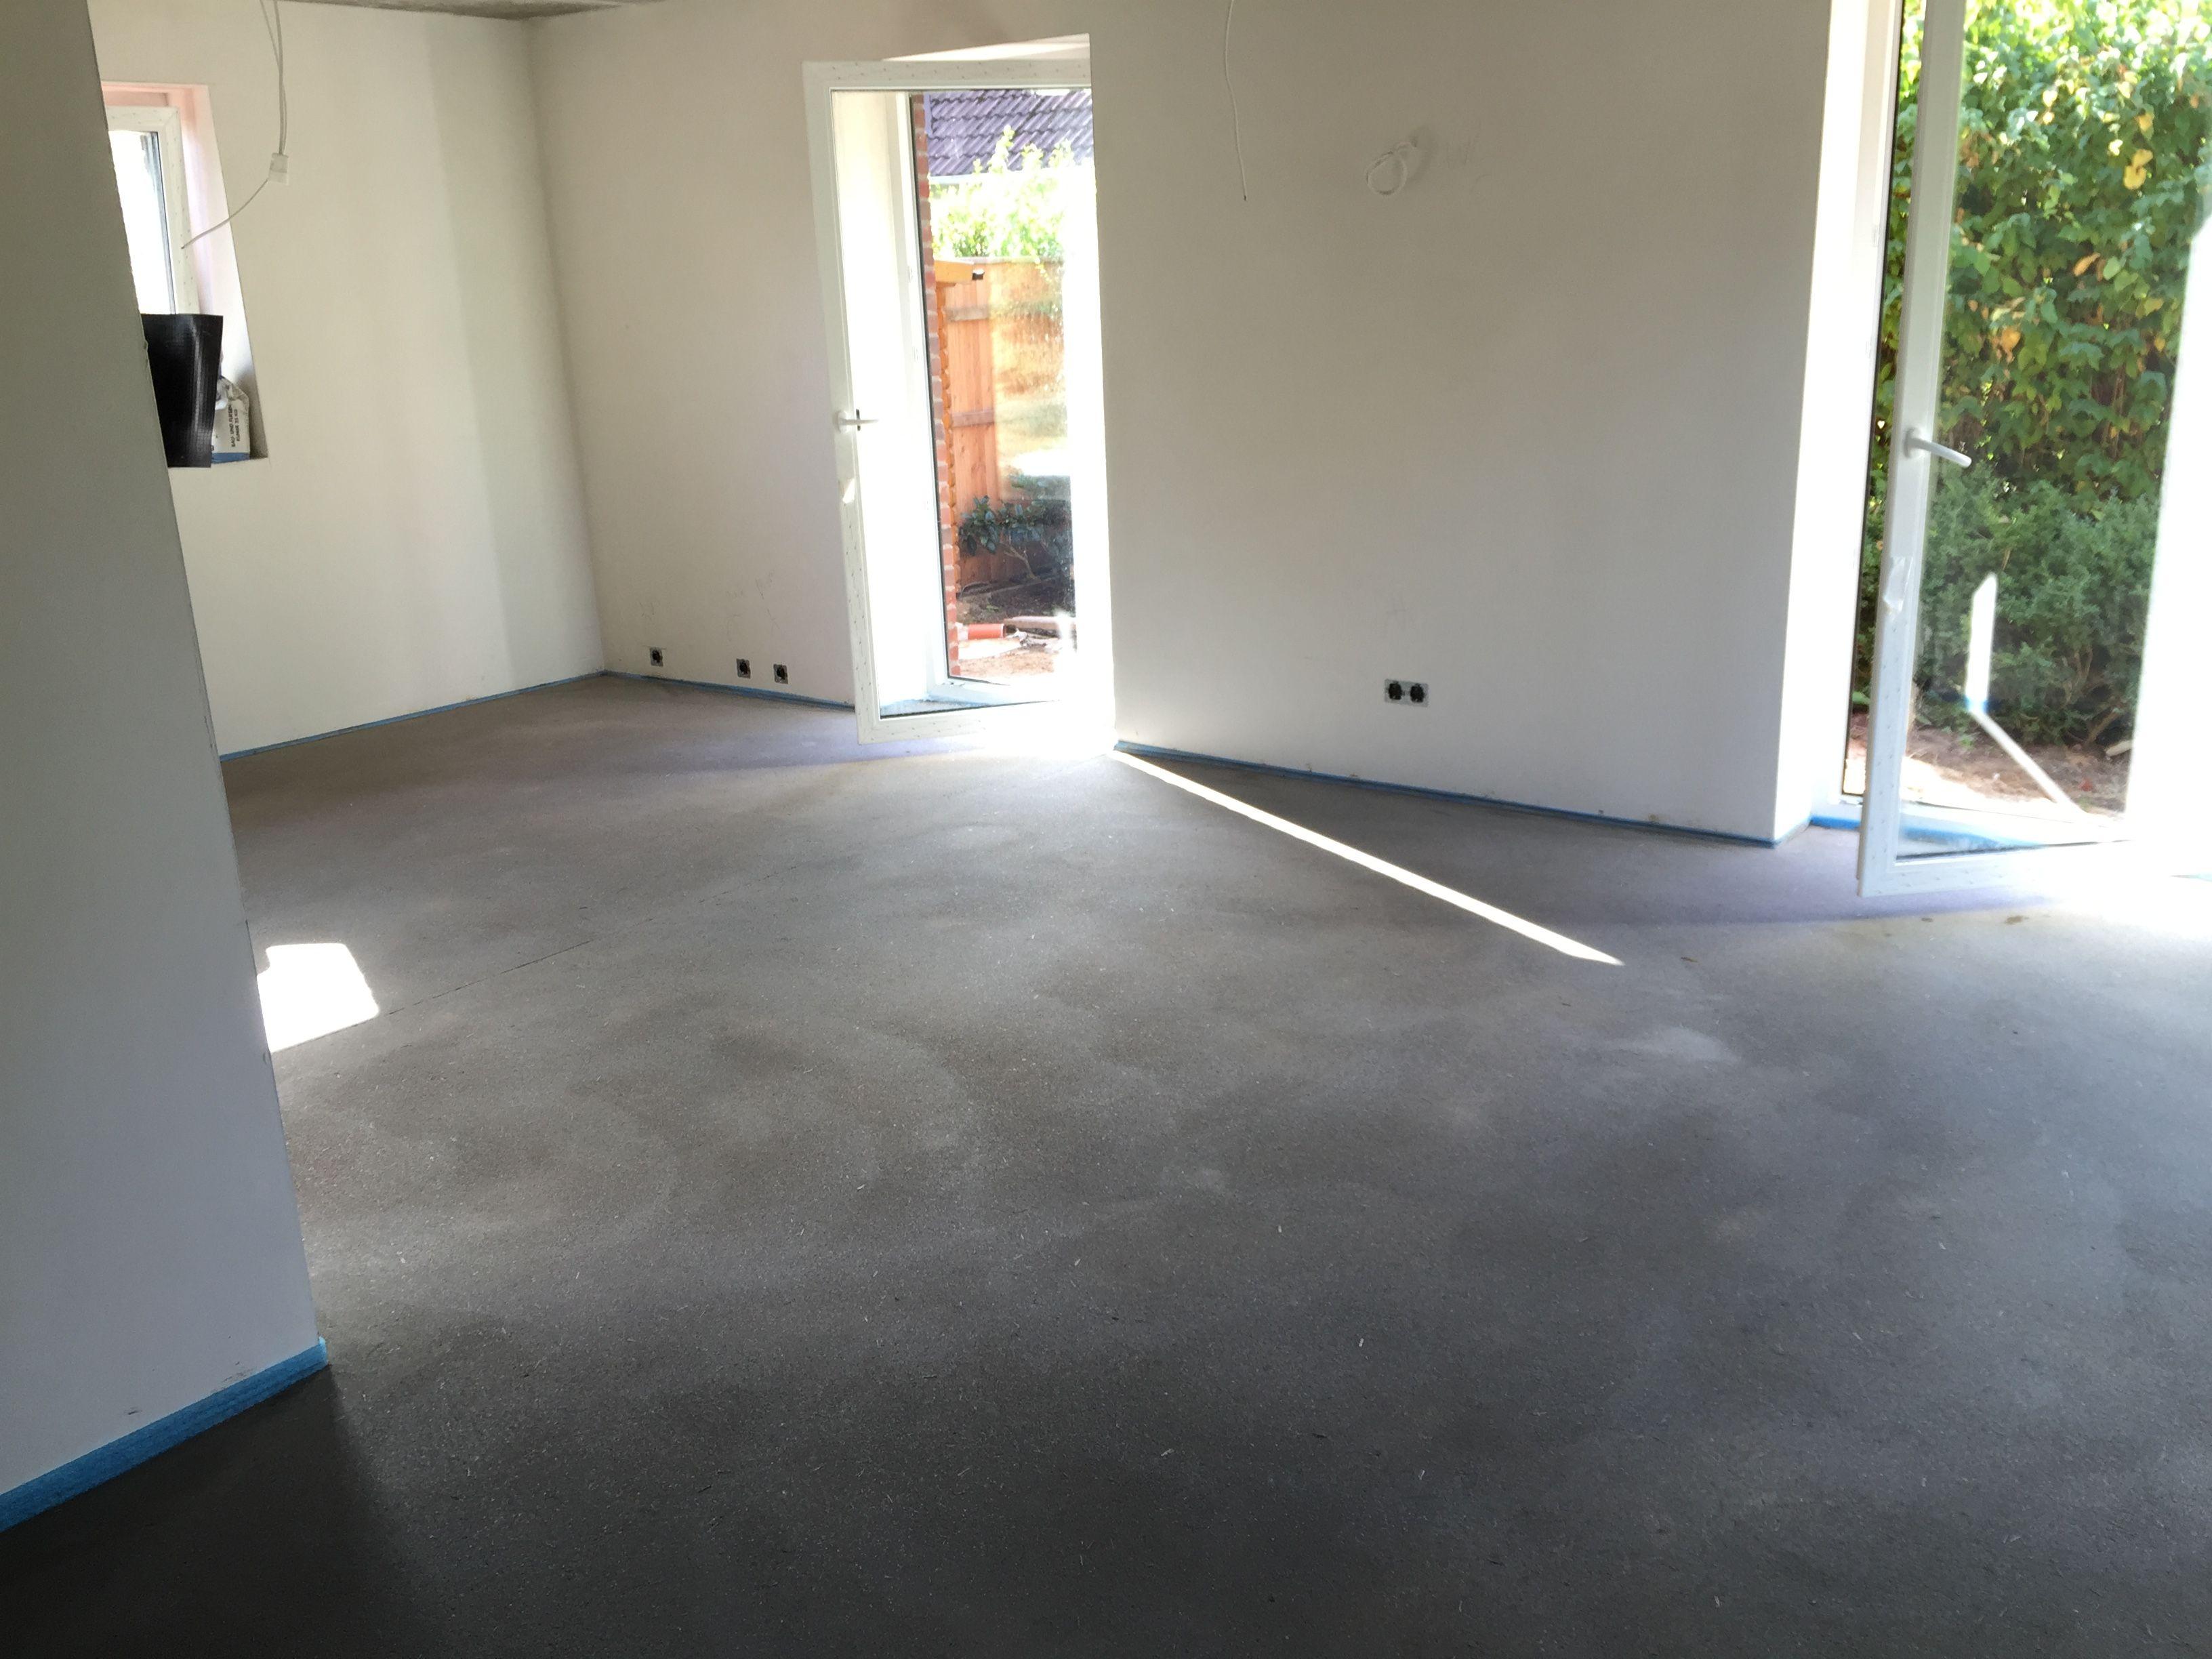 Estrich Trocknen Bautrocknung Plotzlich Bauherr Estrich Haus Planung Bau